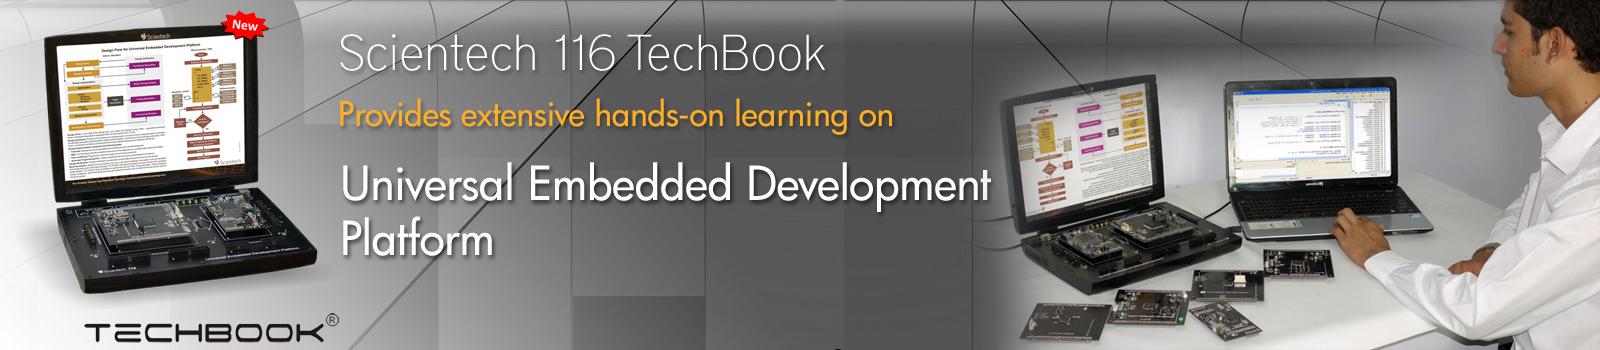 Universal Embedded Development Platform